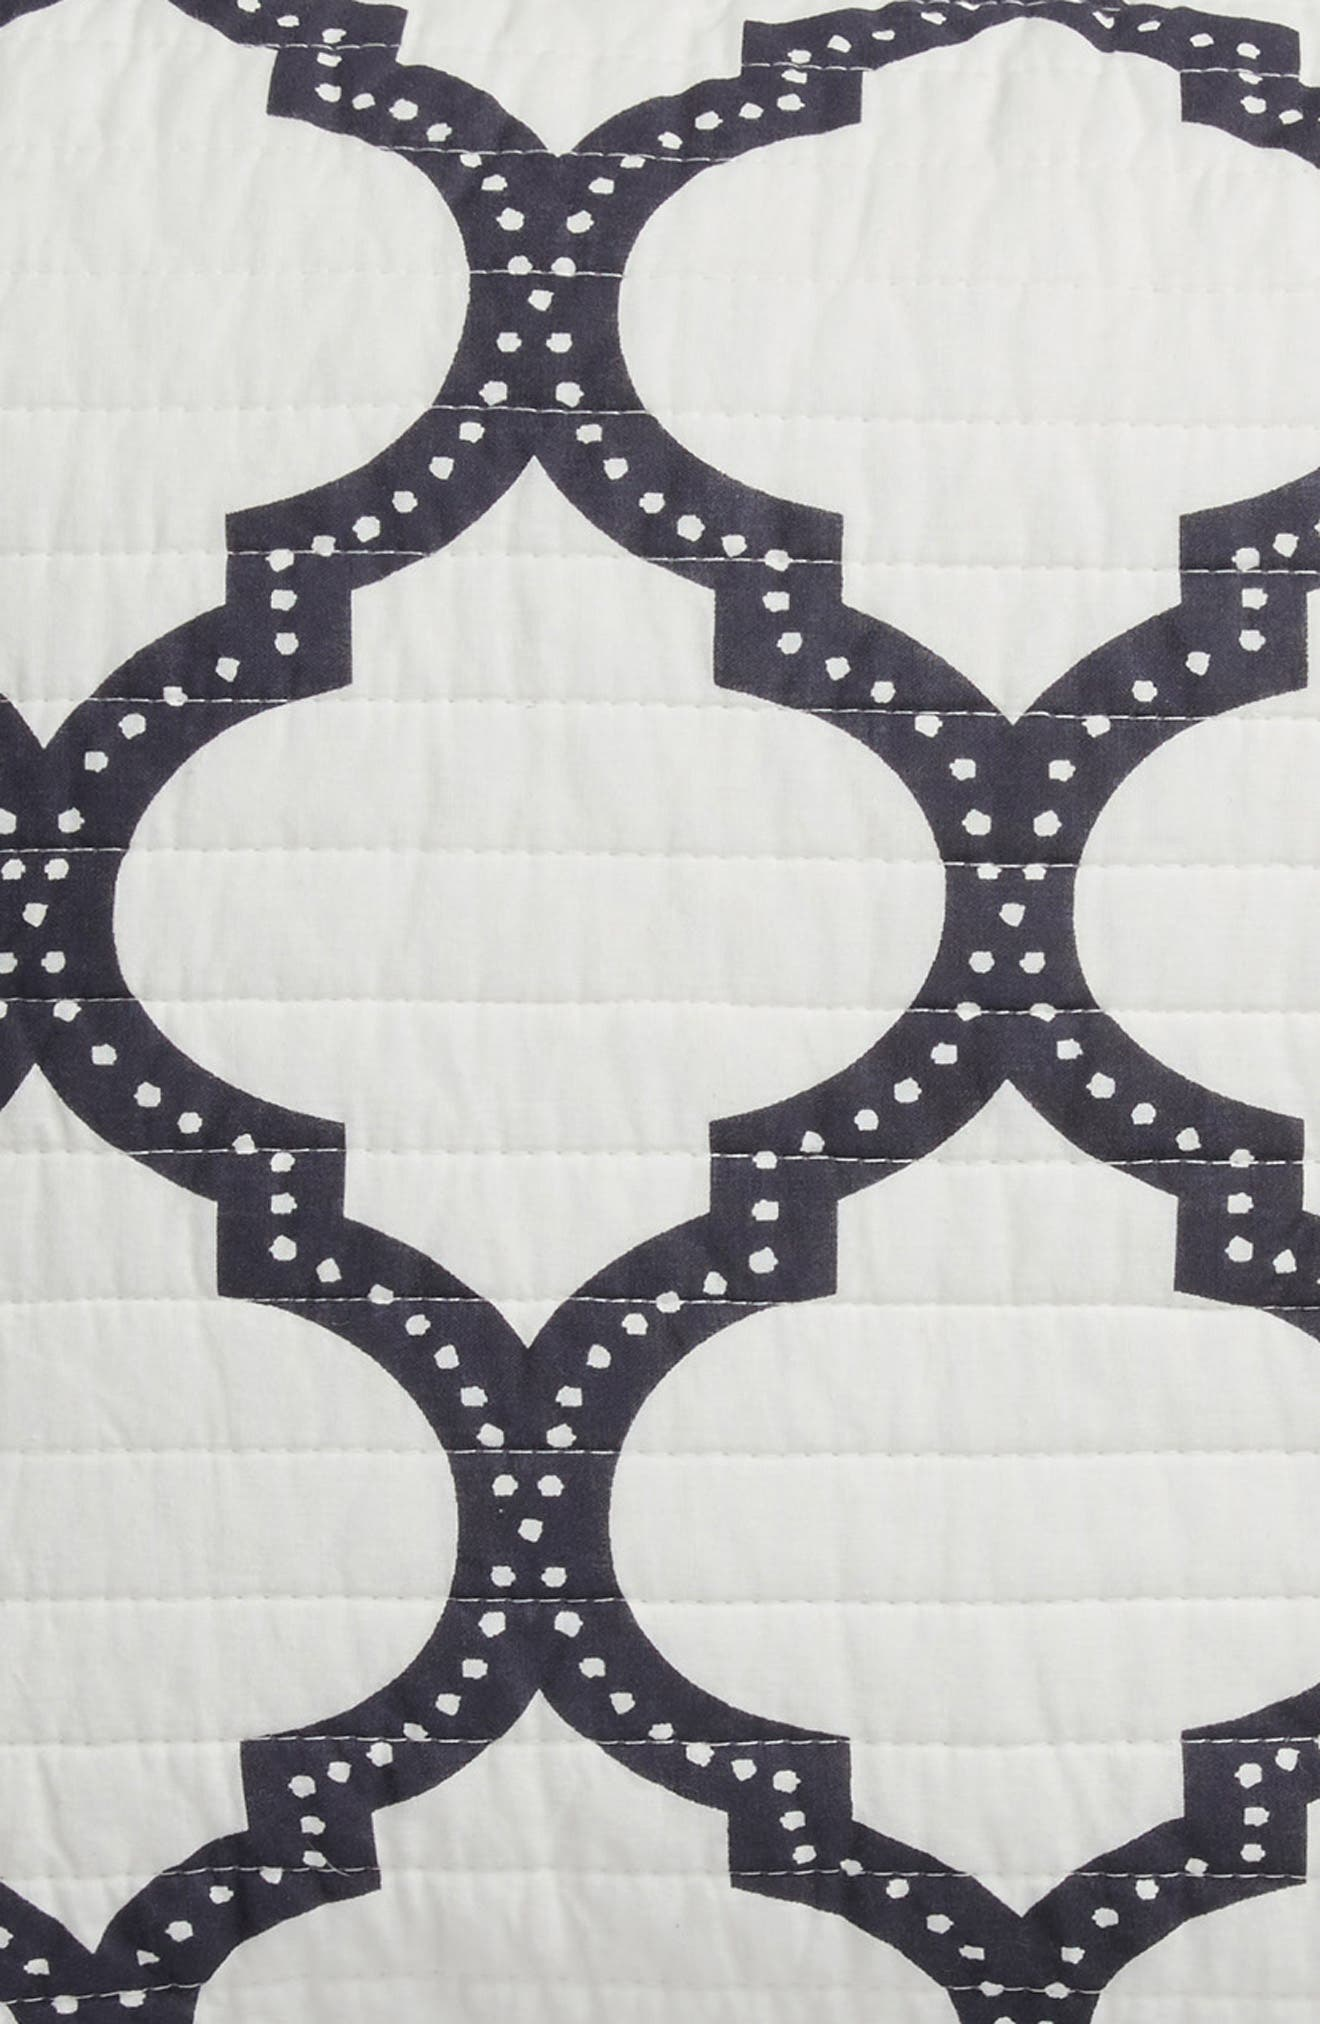 Moroccan Charcoal Sham,                             Alternate thumbnail 2, color,                             Charcoal